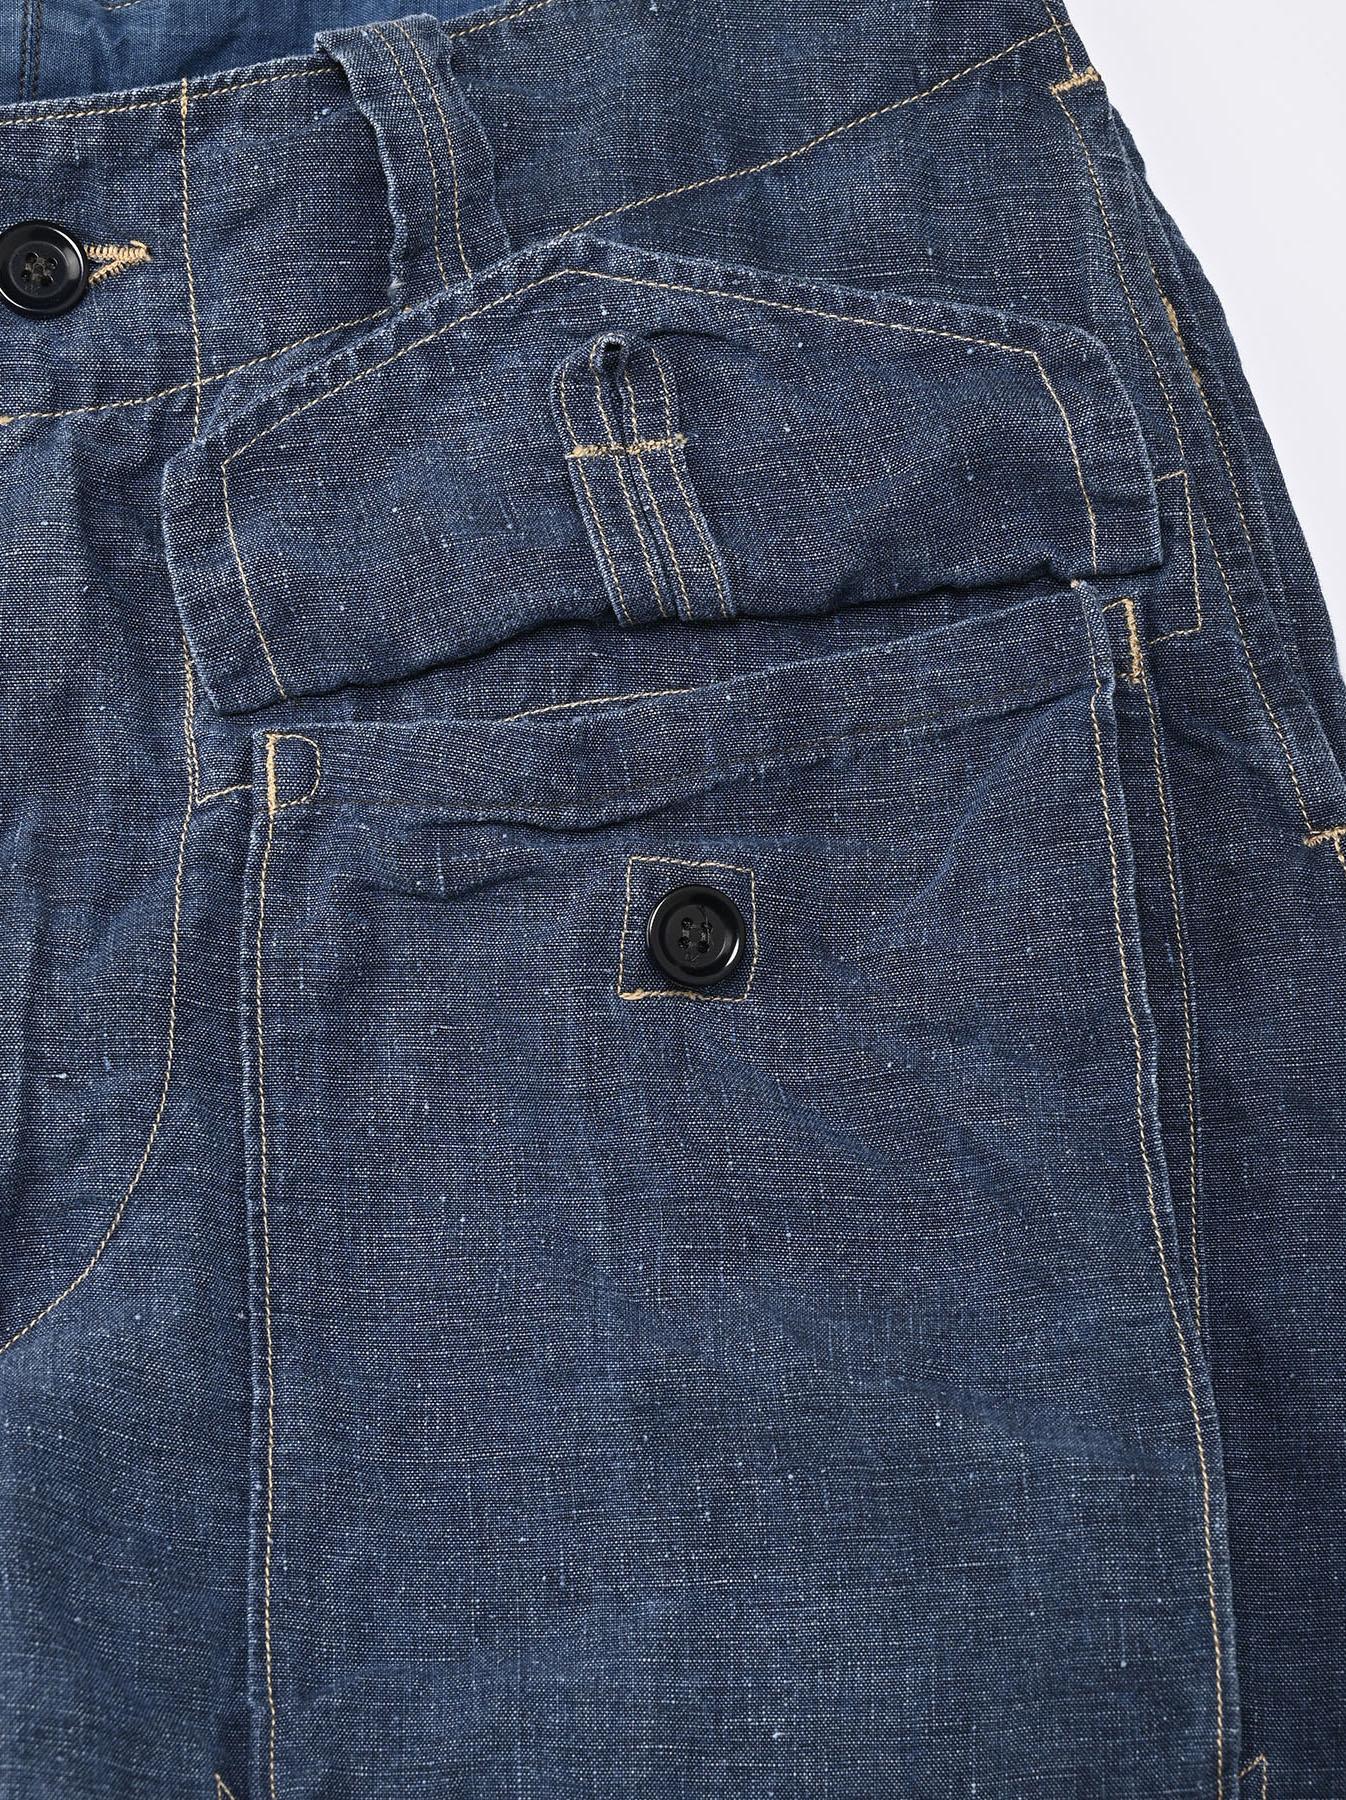 Indigo Linen 908 Easy Sail Shorts Distressed (0721)-9